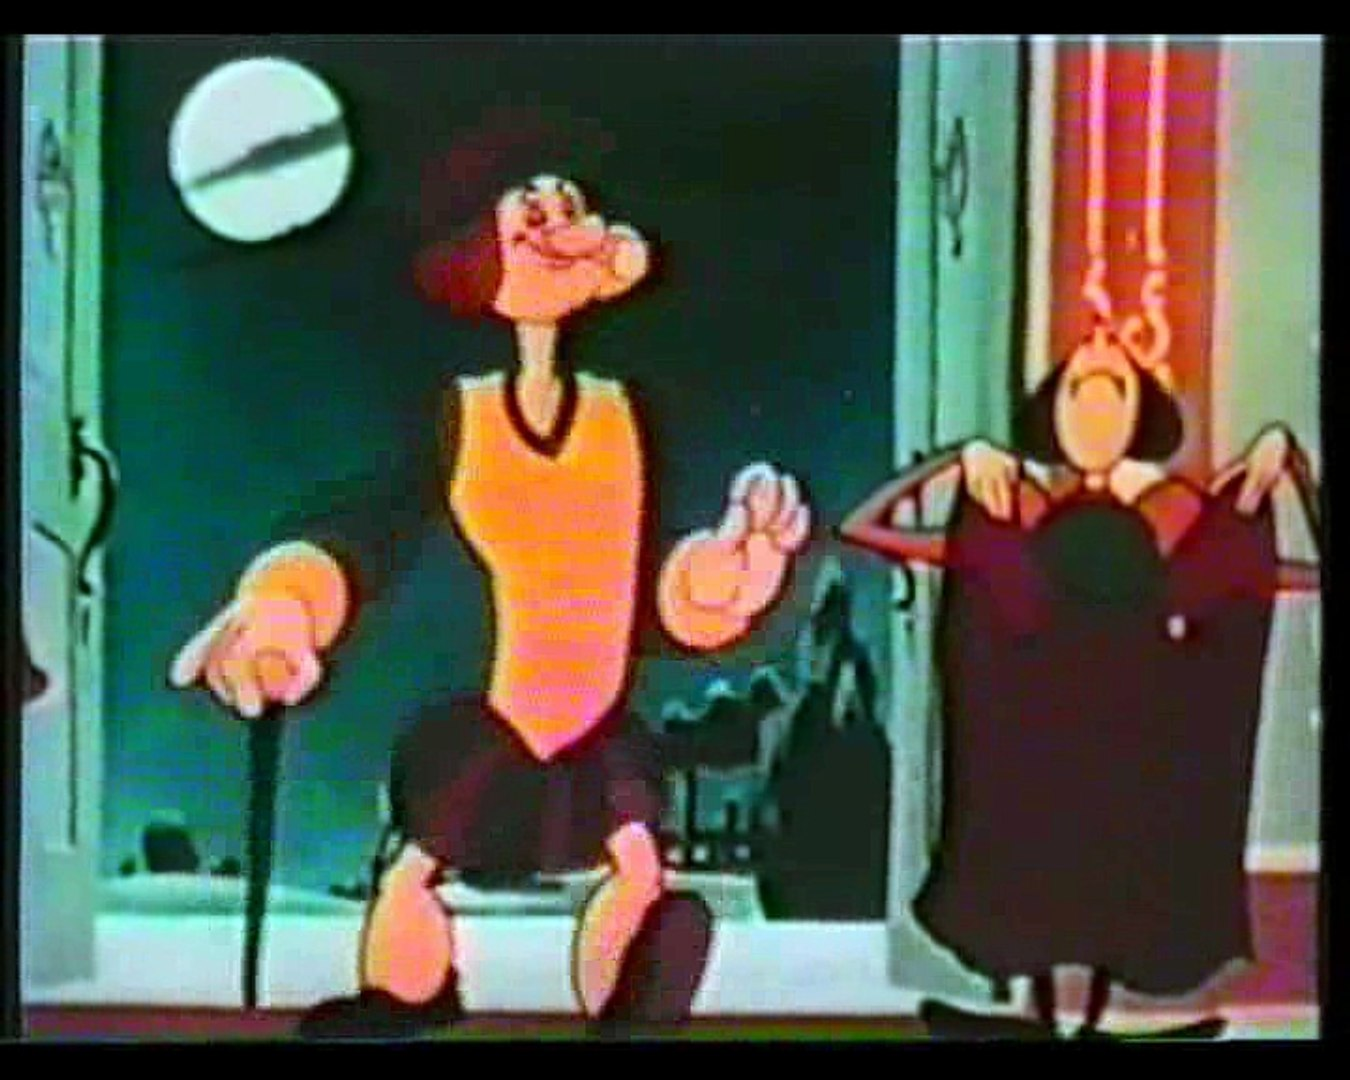 Braccio Di Ferro Popeye Cenerentolo Ita Streaming Video Dailymotion